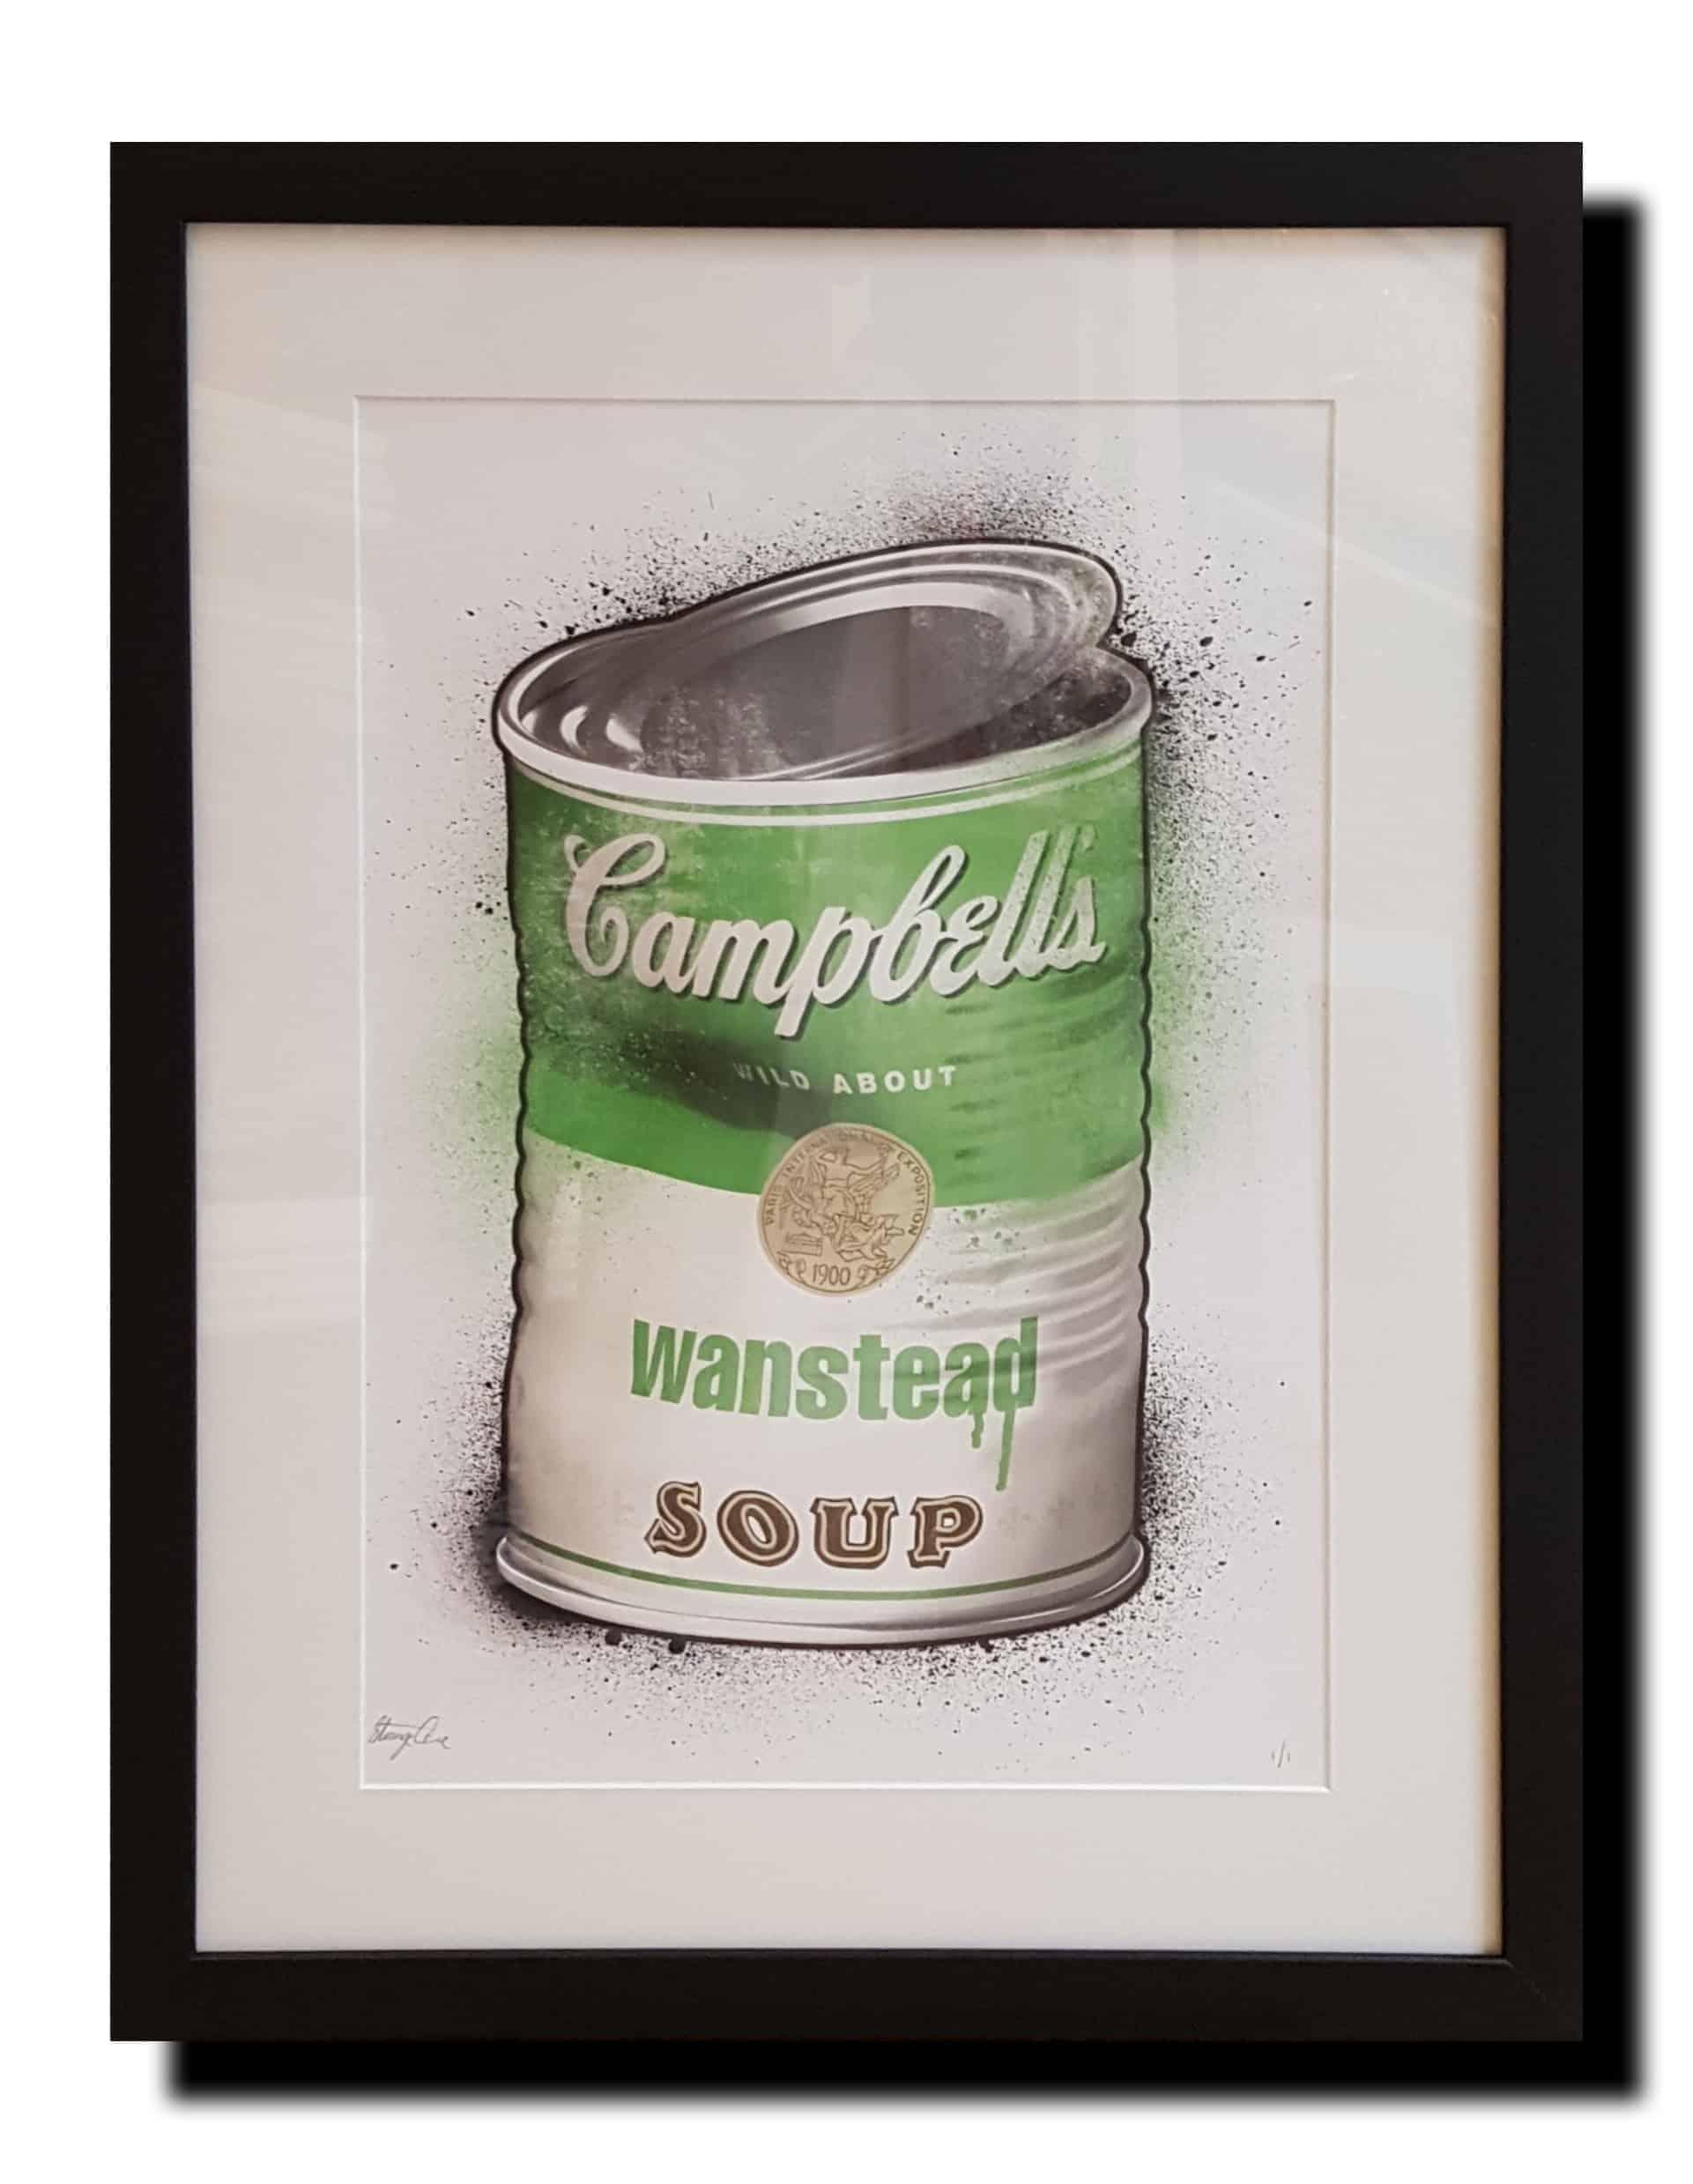 wanstead soup framed